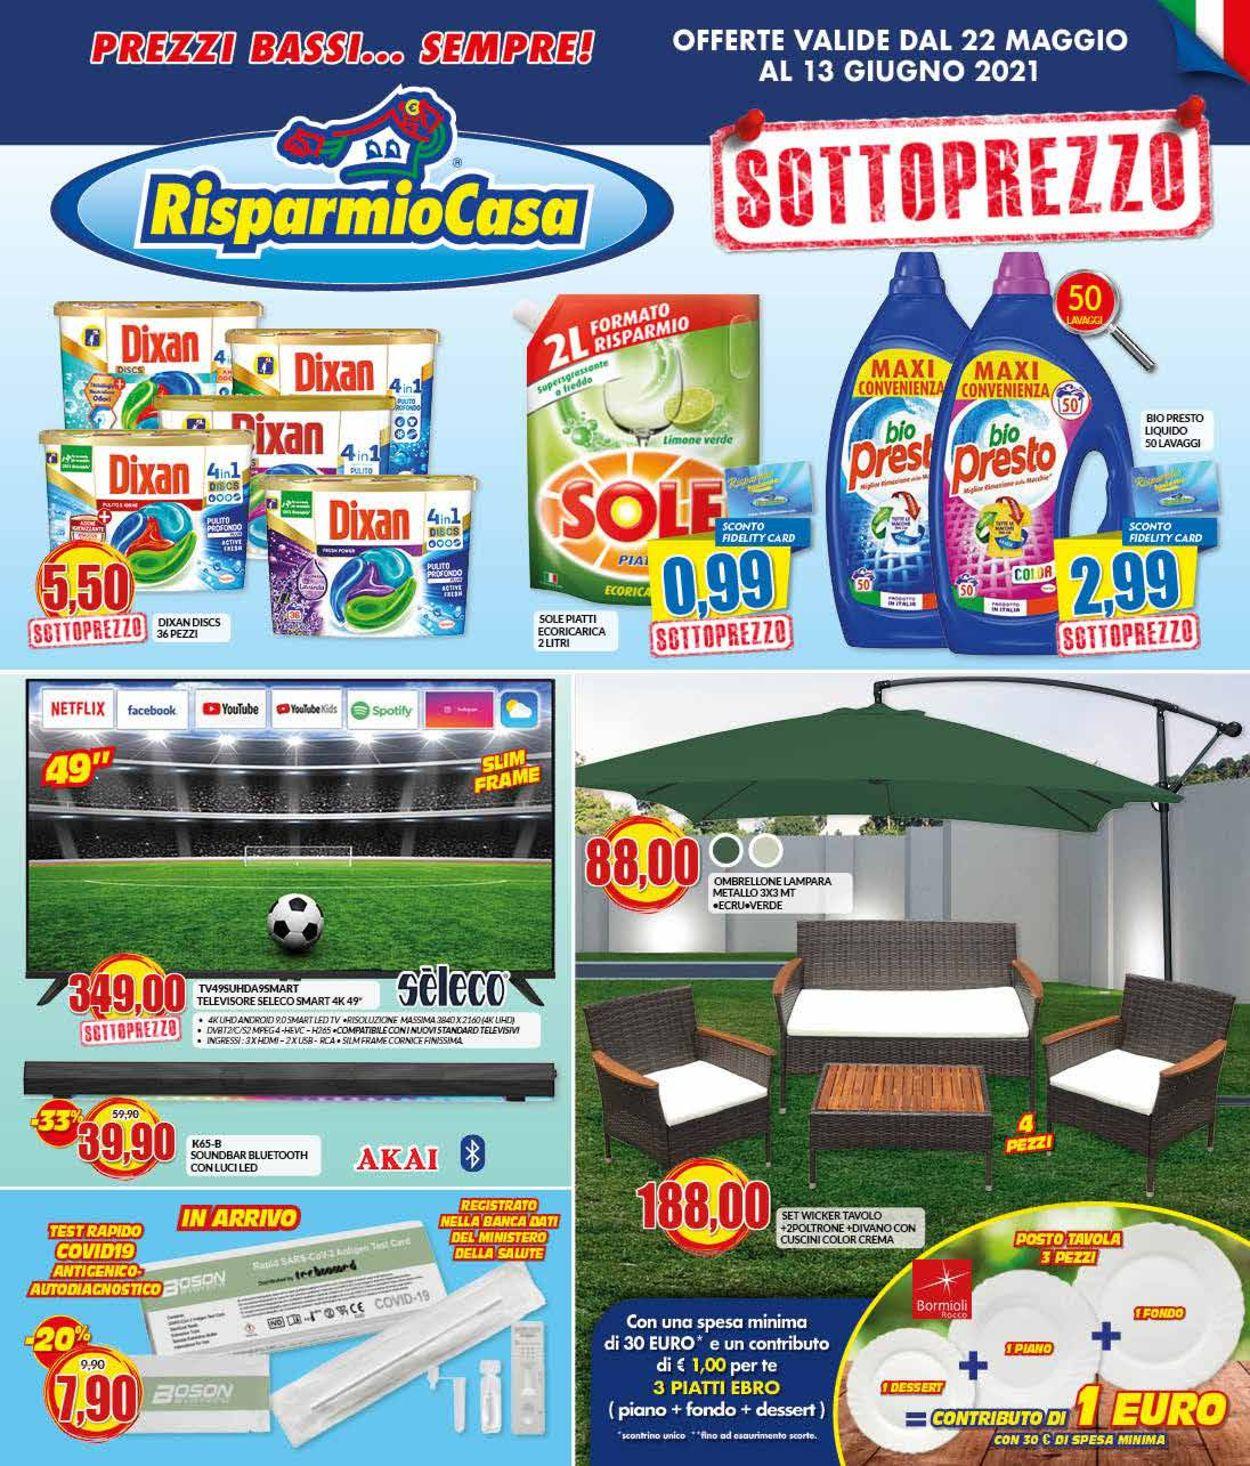 Volantino Risparmio Casa - Offerte 22/05-13/06/2021